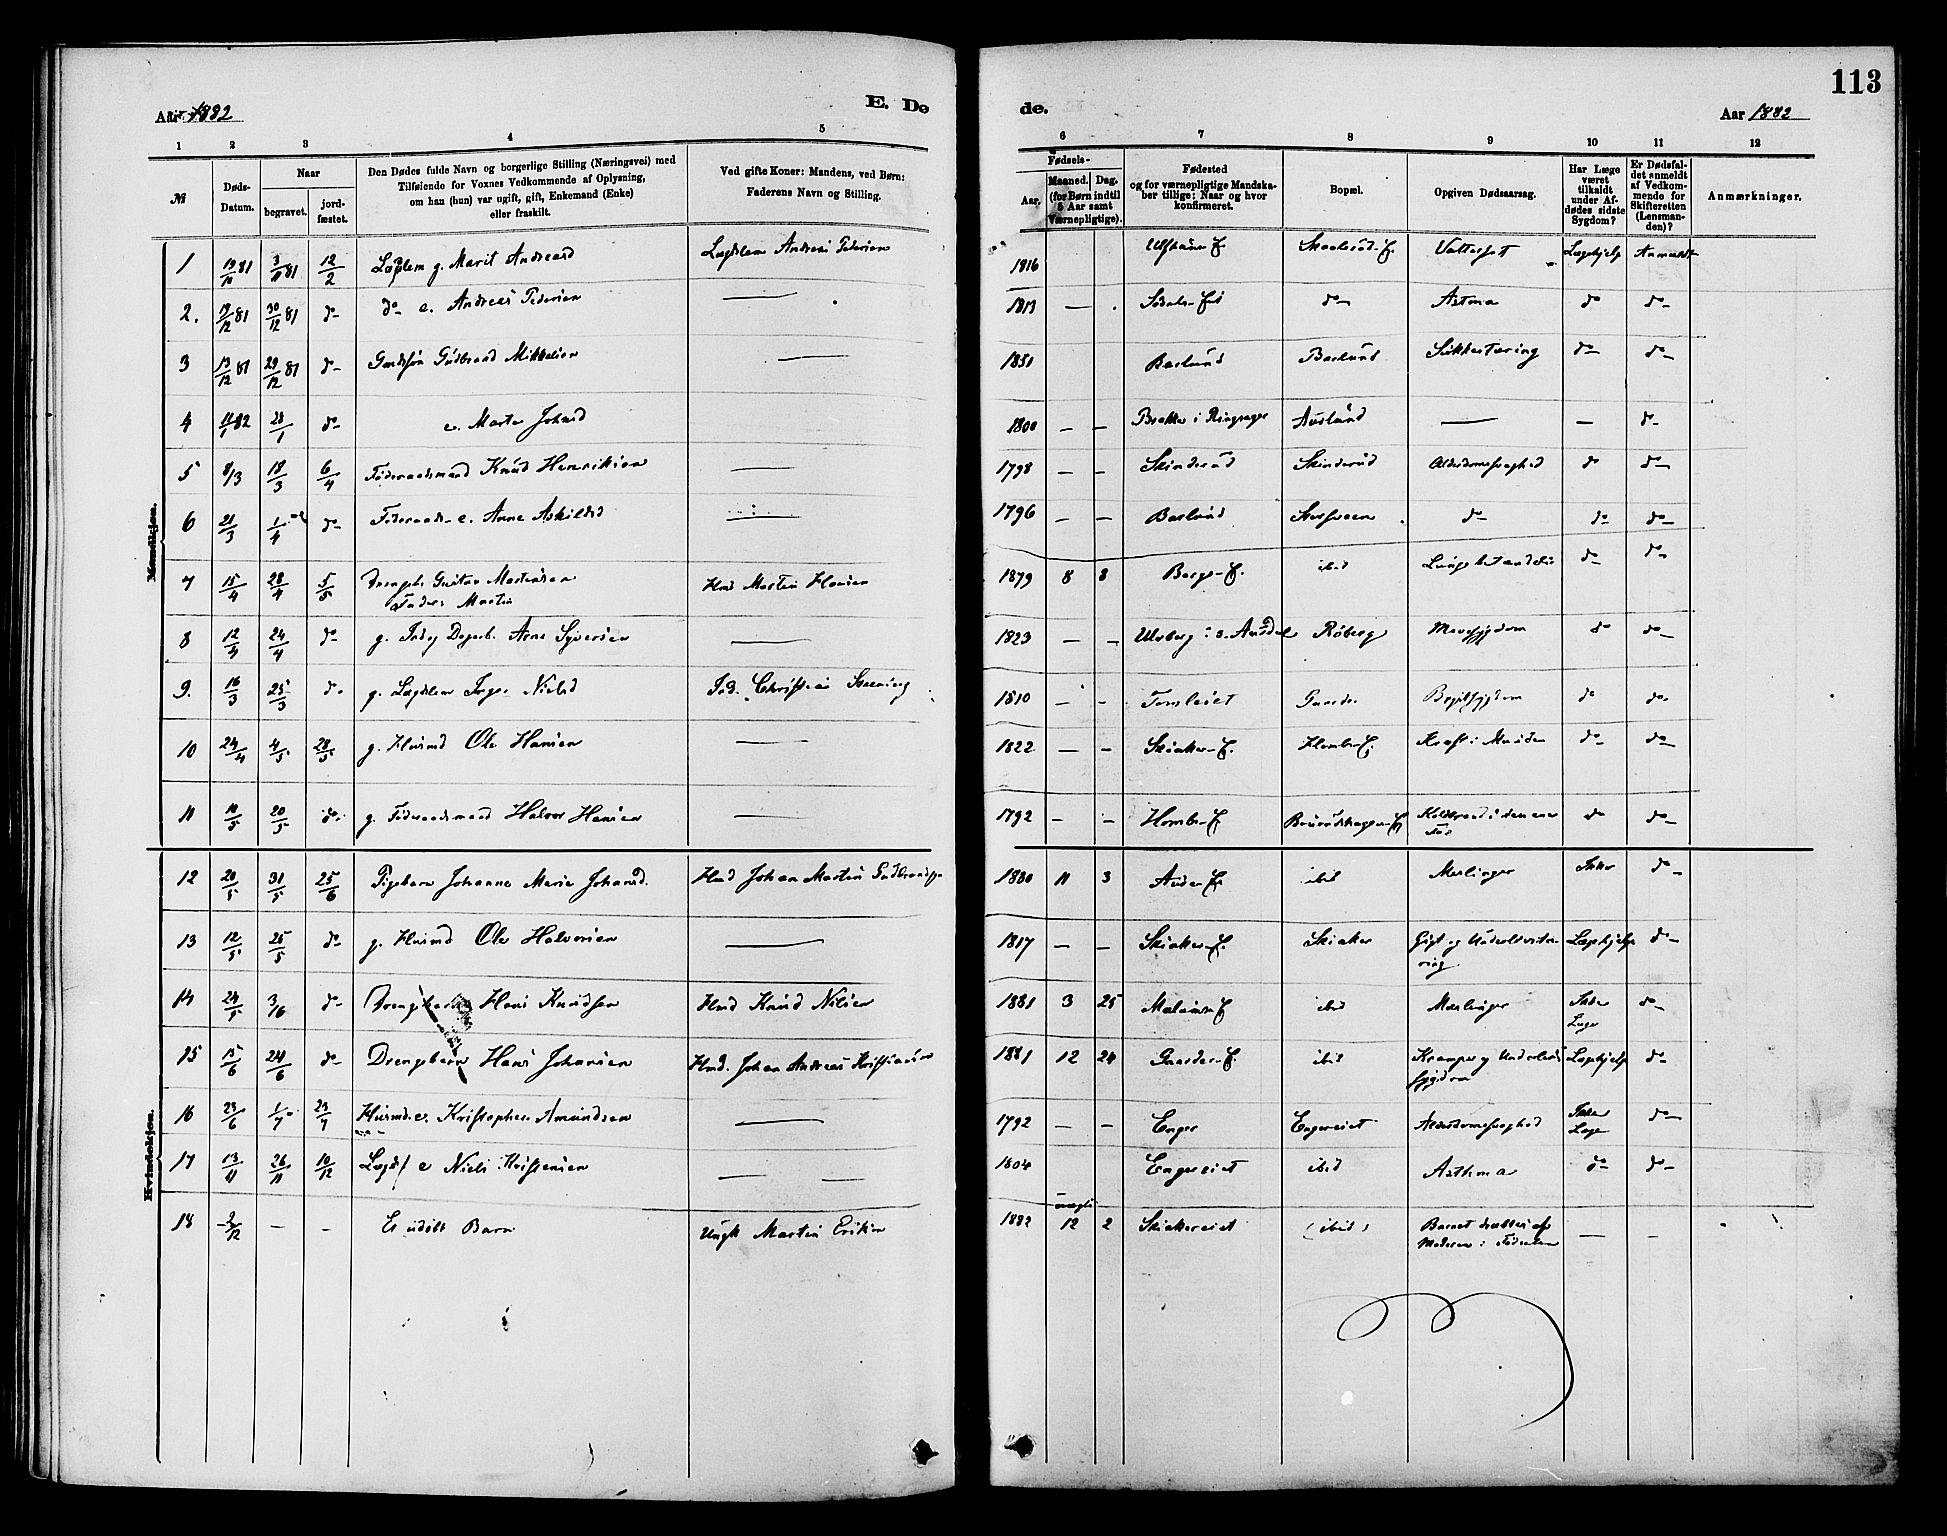 SAH, Nordre Land prestekontor, Ministerialbok nr. 3, 1882-1896, s. 113